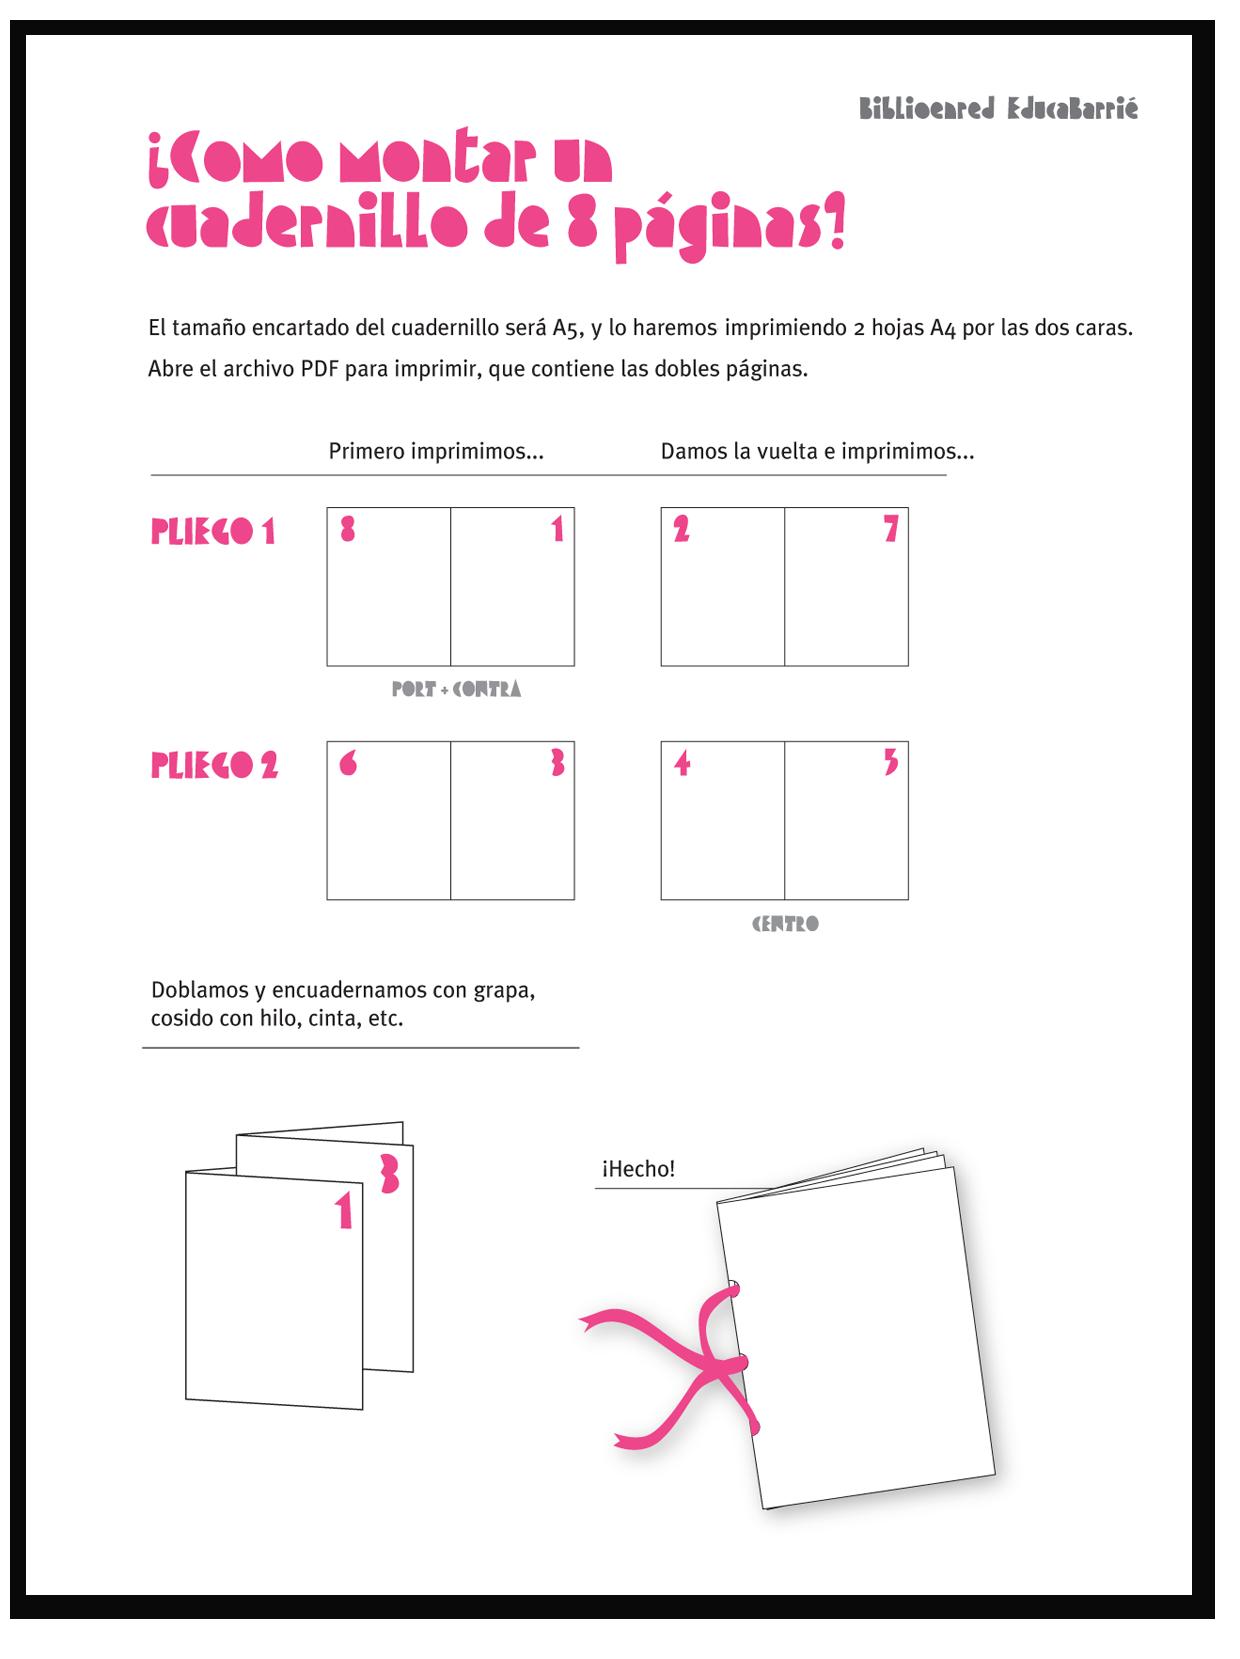 cuadernillo-8-paginas